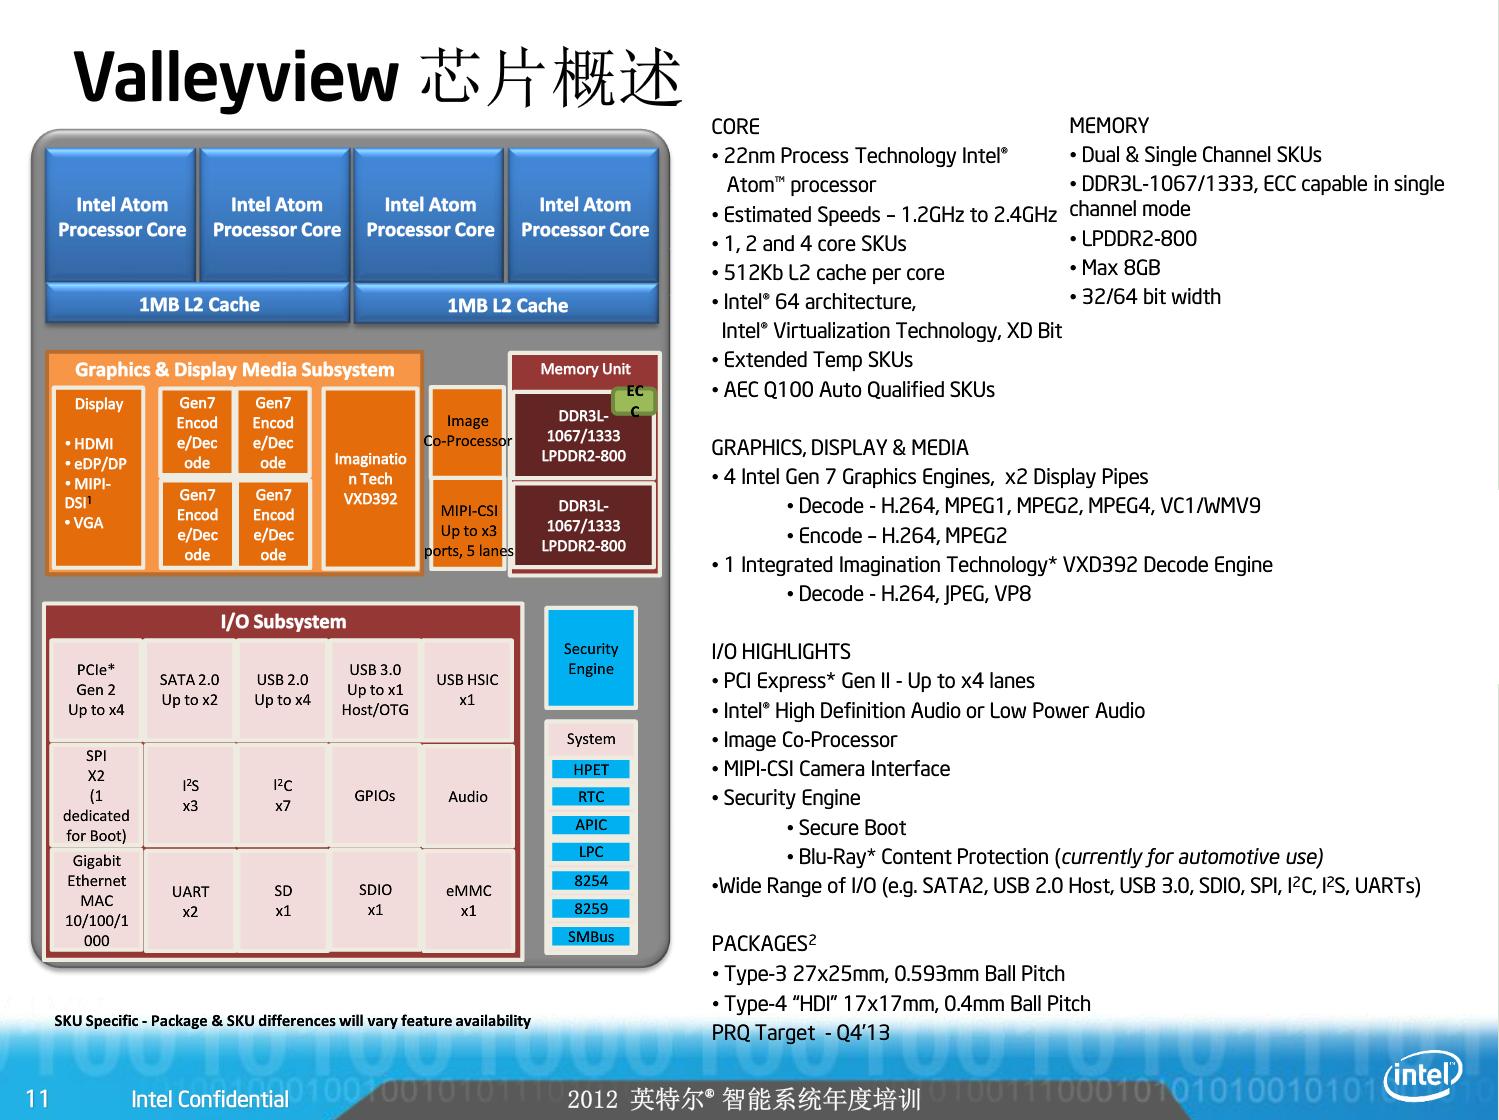 New quad-core Intel Atom SoCs target PCs, servers, and tablets | Ars